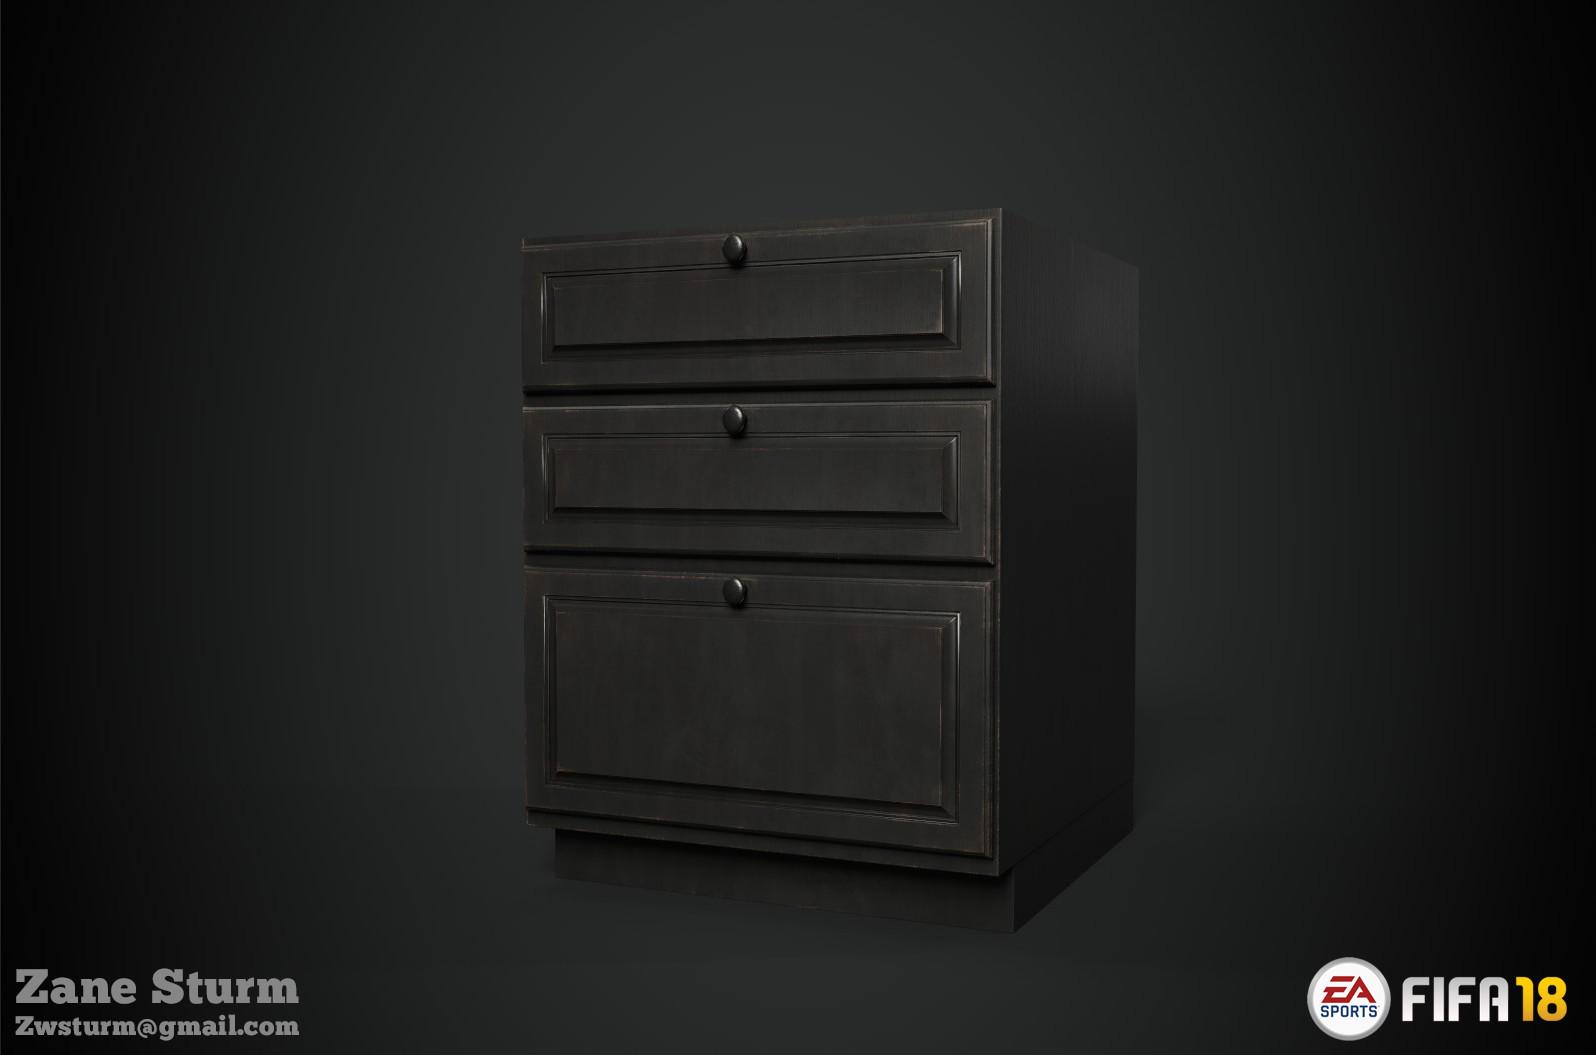 Zane sturm cabiner drawers